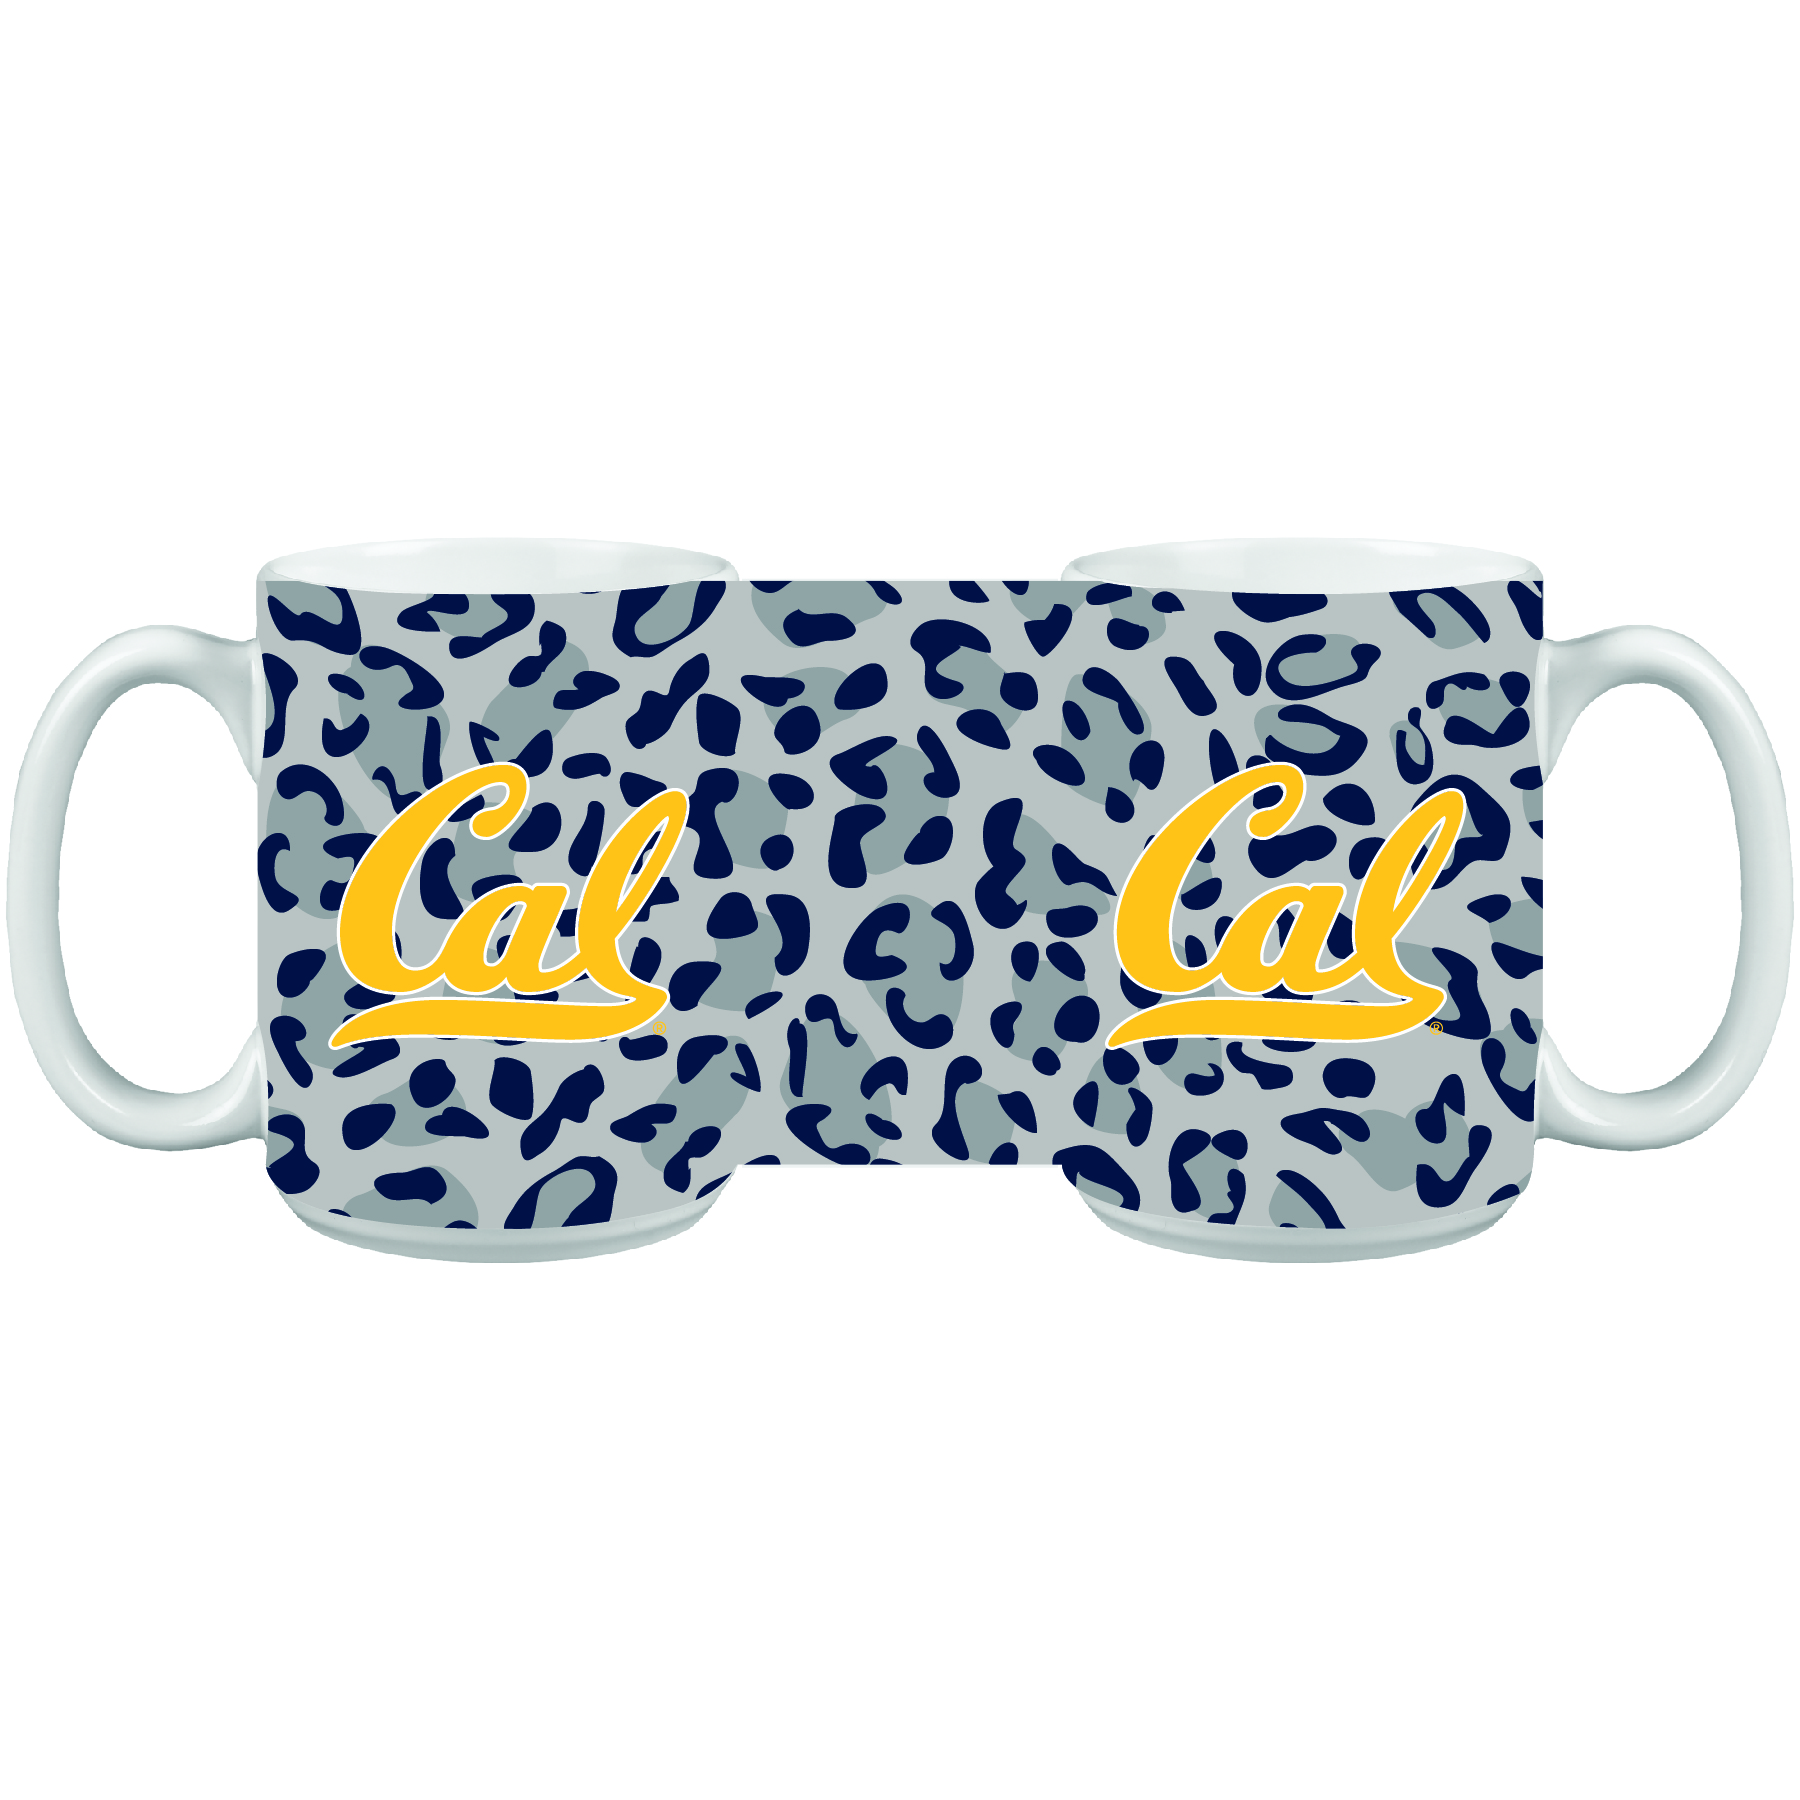 Mug 15oz Impact Cal Logo Leopard Print